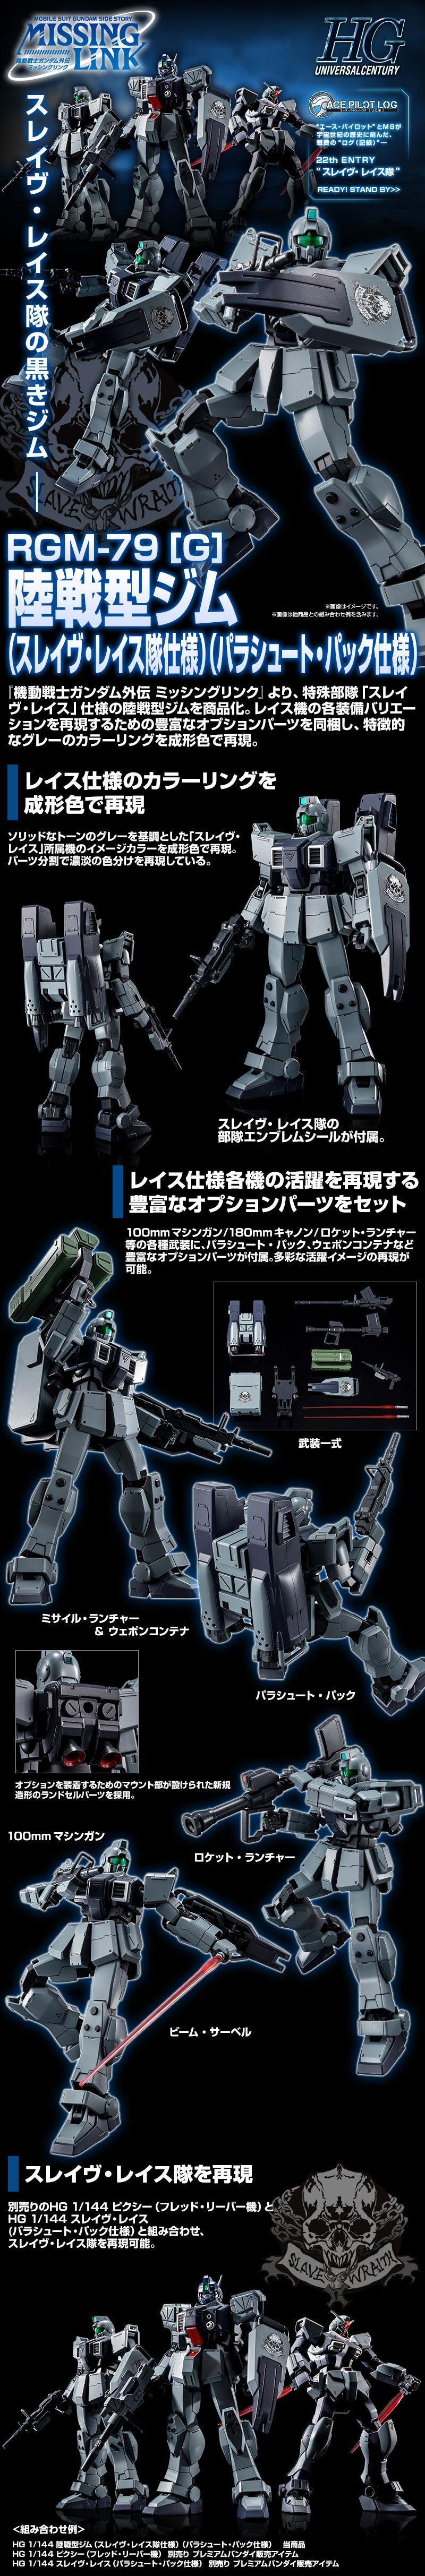 HGUC GM Ground Type (Slave Wraith Team Custom) (Parachute Pack) Details